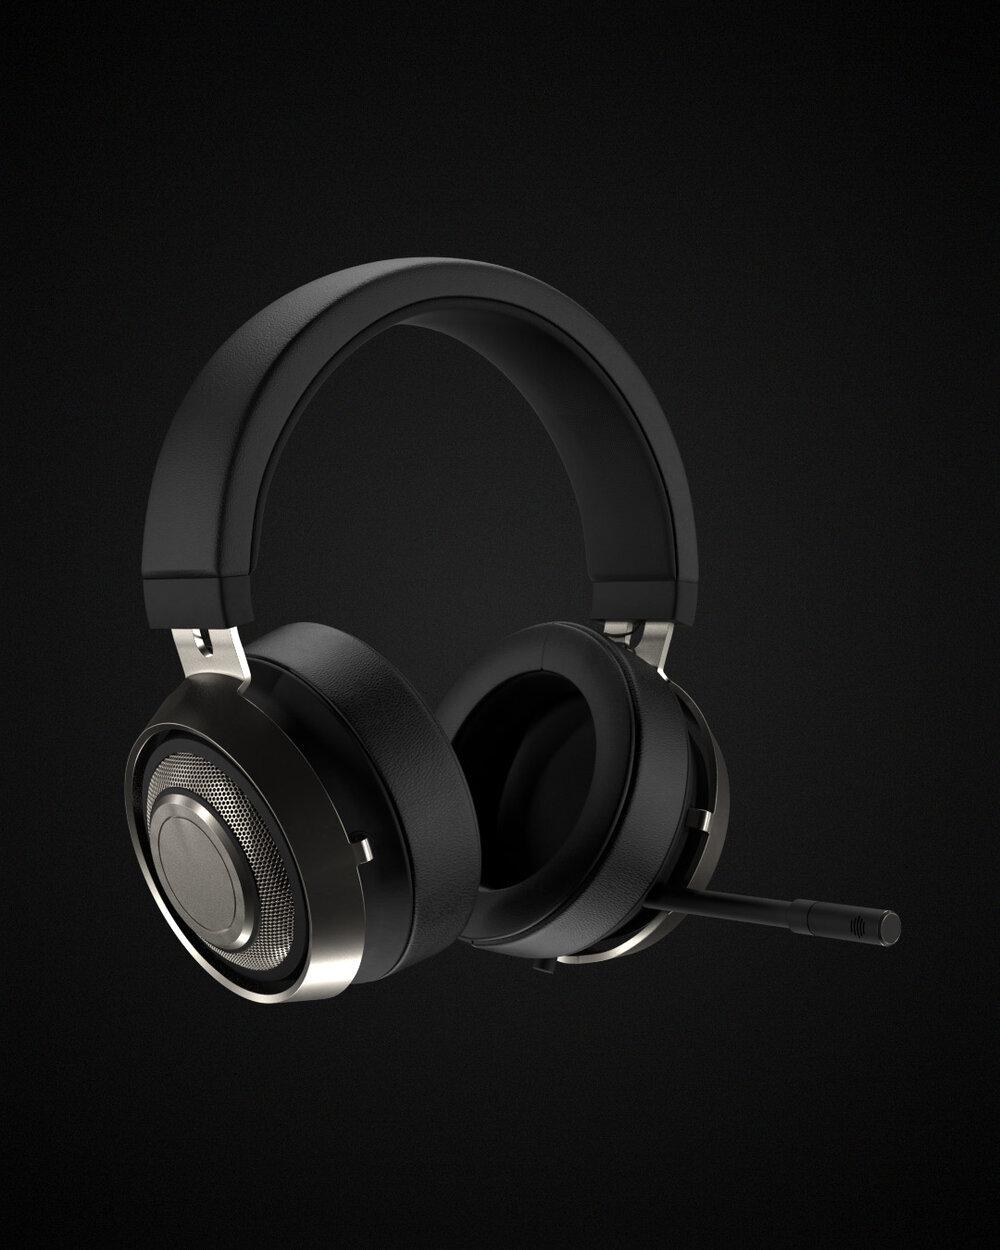 Headset_SideRightView.jpg